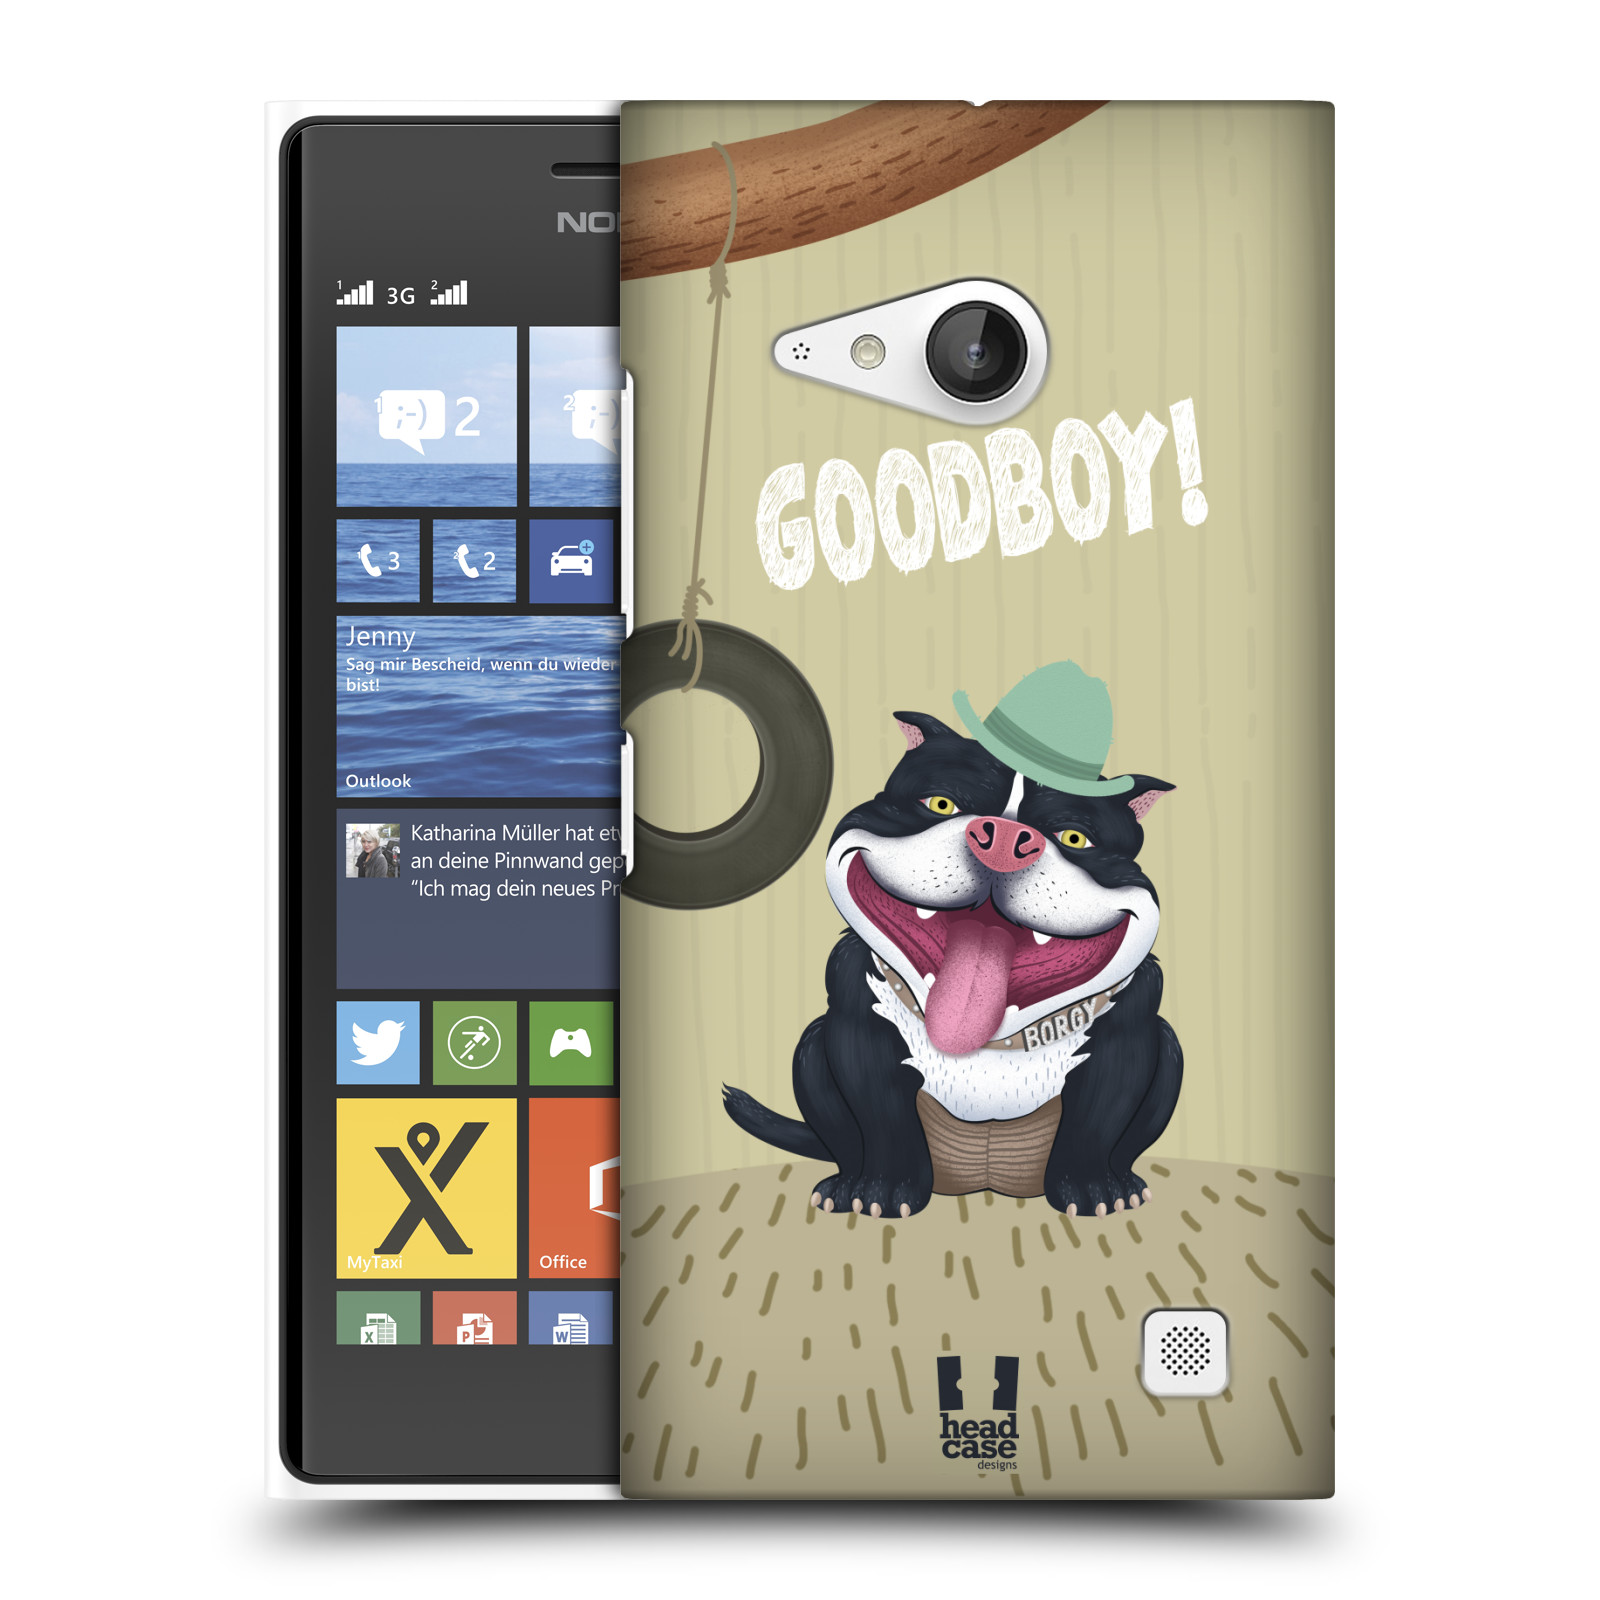 Plastové pouzdro na mobil Nokia Lumia 730 Dual SIM HEAD CASE Goodboy! Pejsek (Kryt či obal na mobilní telefon Nokia Lumia 730 Dual SIM)